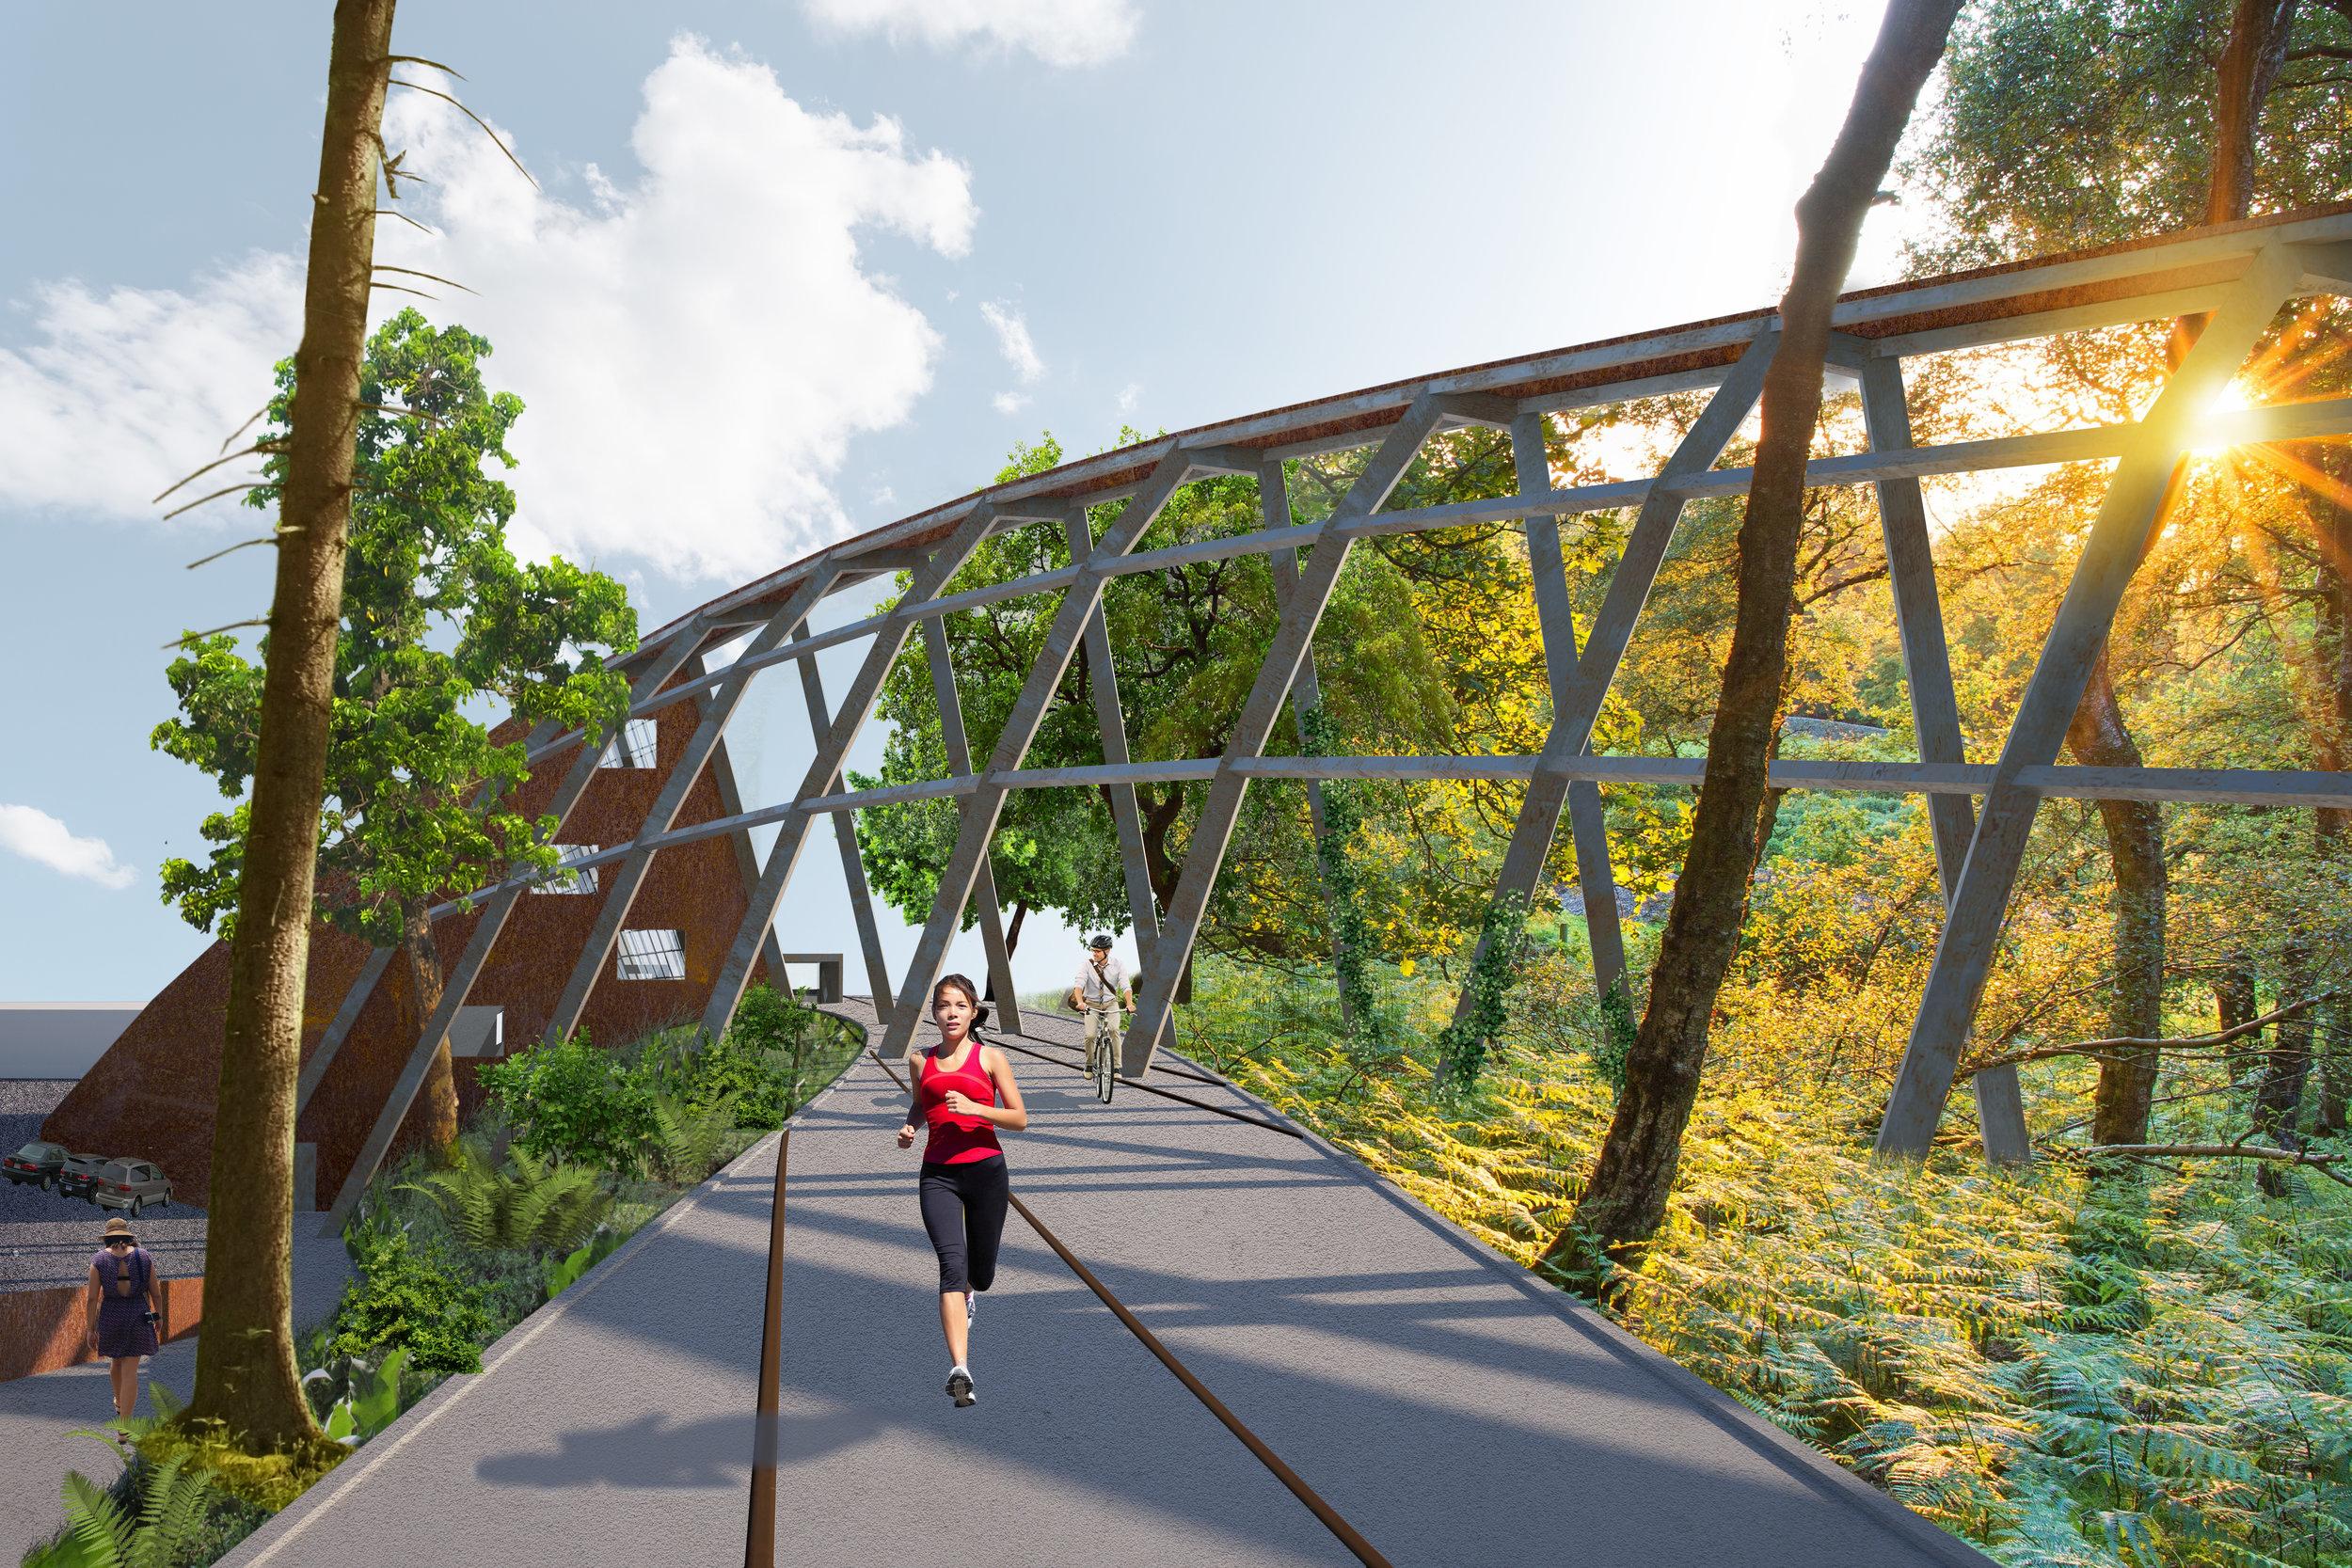 Exterior rendering 2 (forest).jpg